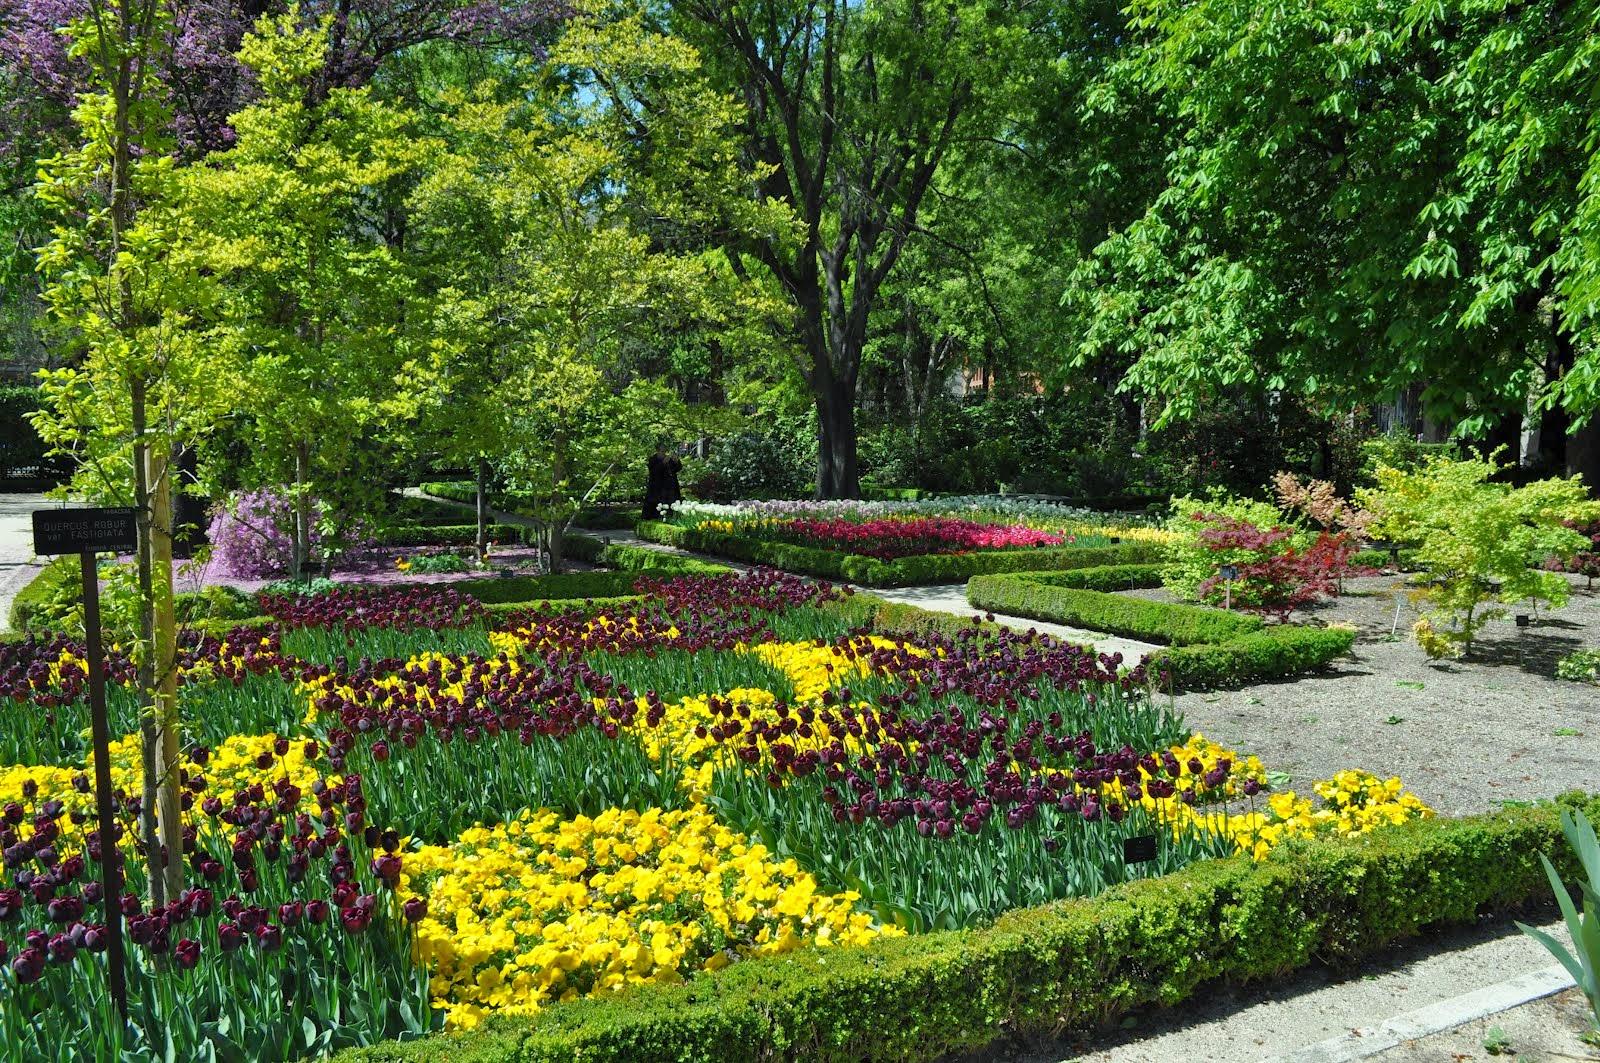 Real Jardín Botánico em Madri